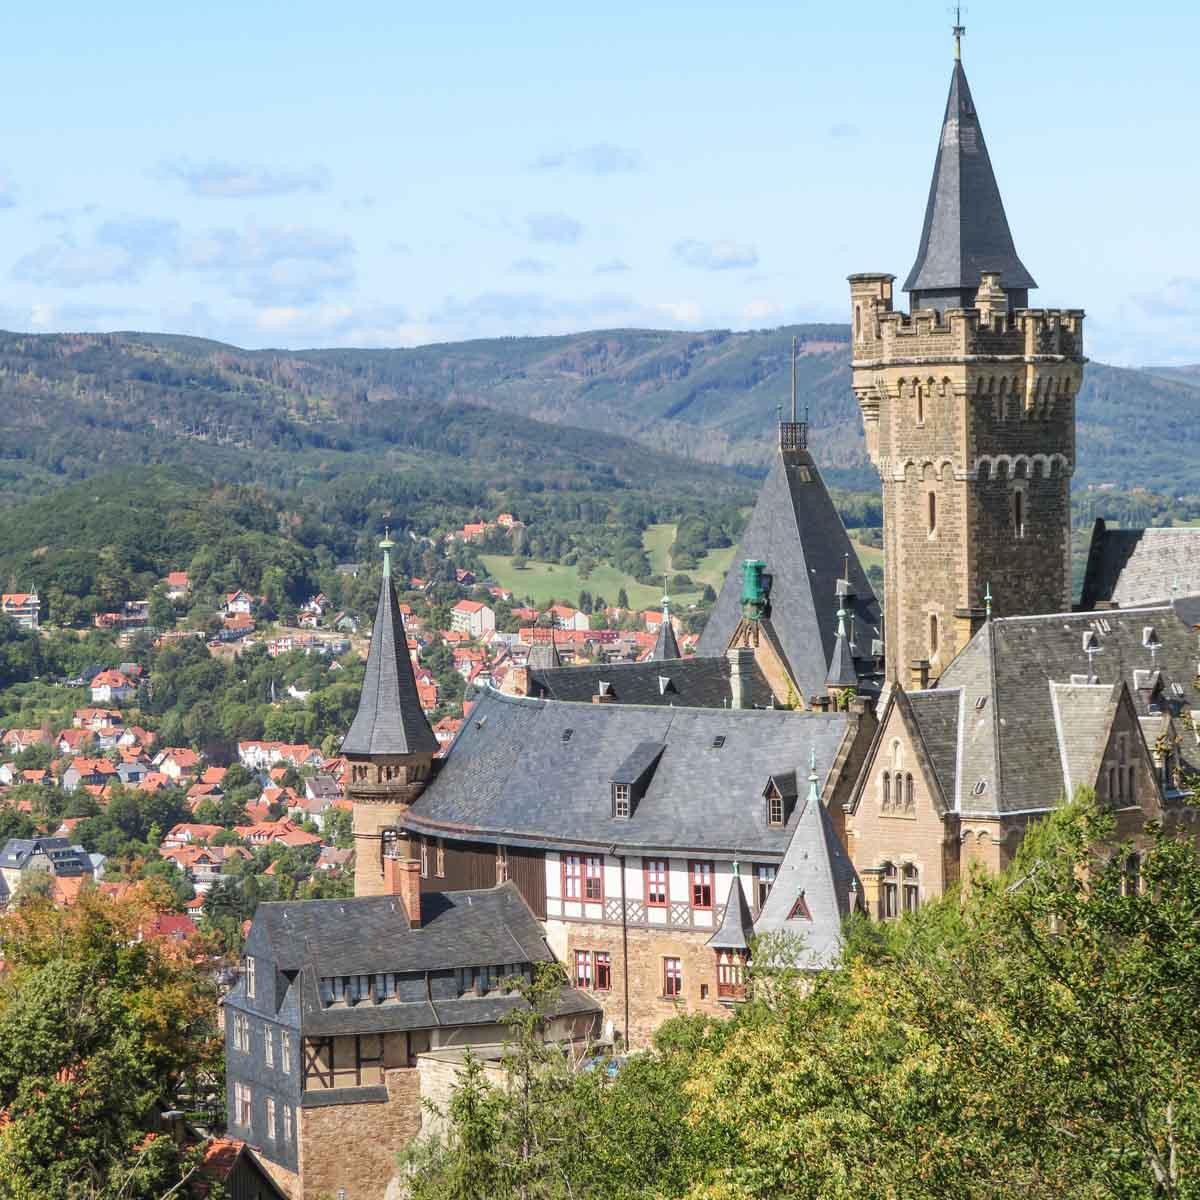 4x de mooiste steden in de Harz [en wat je er kunt doen], kasteel Wernigerode